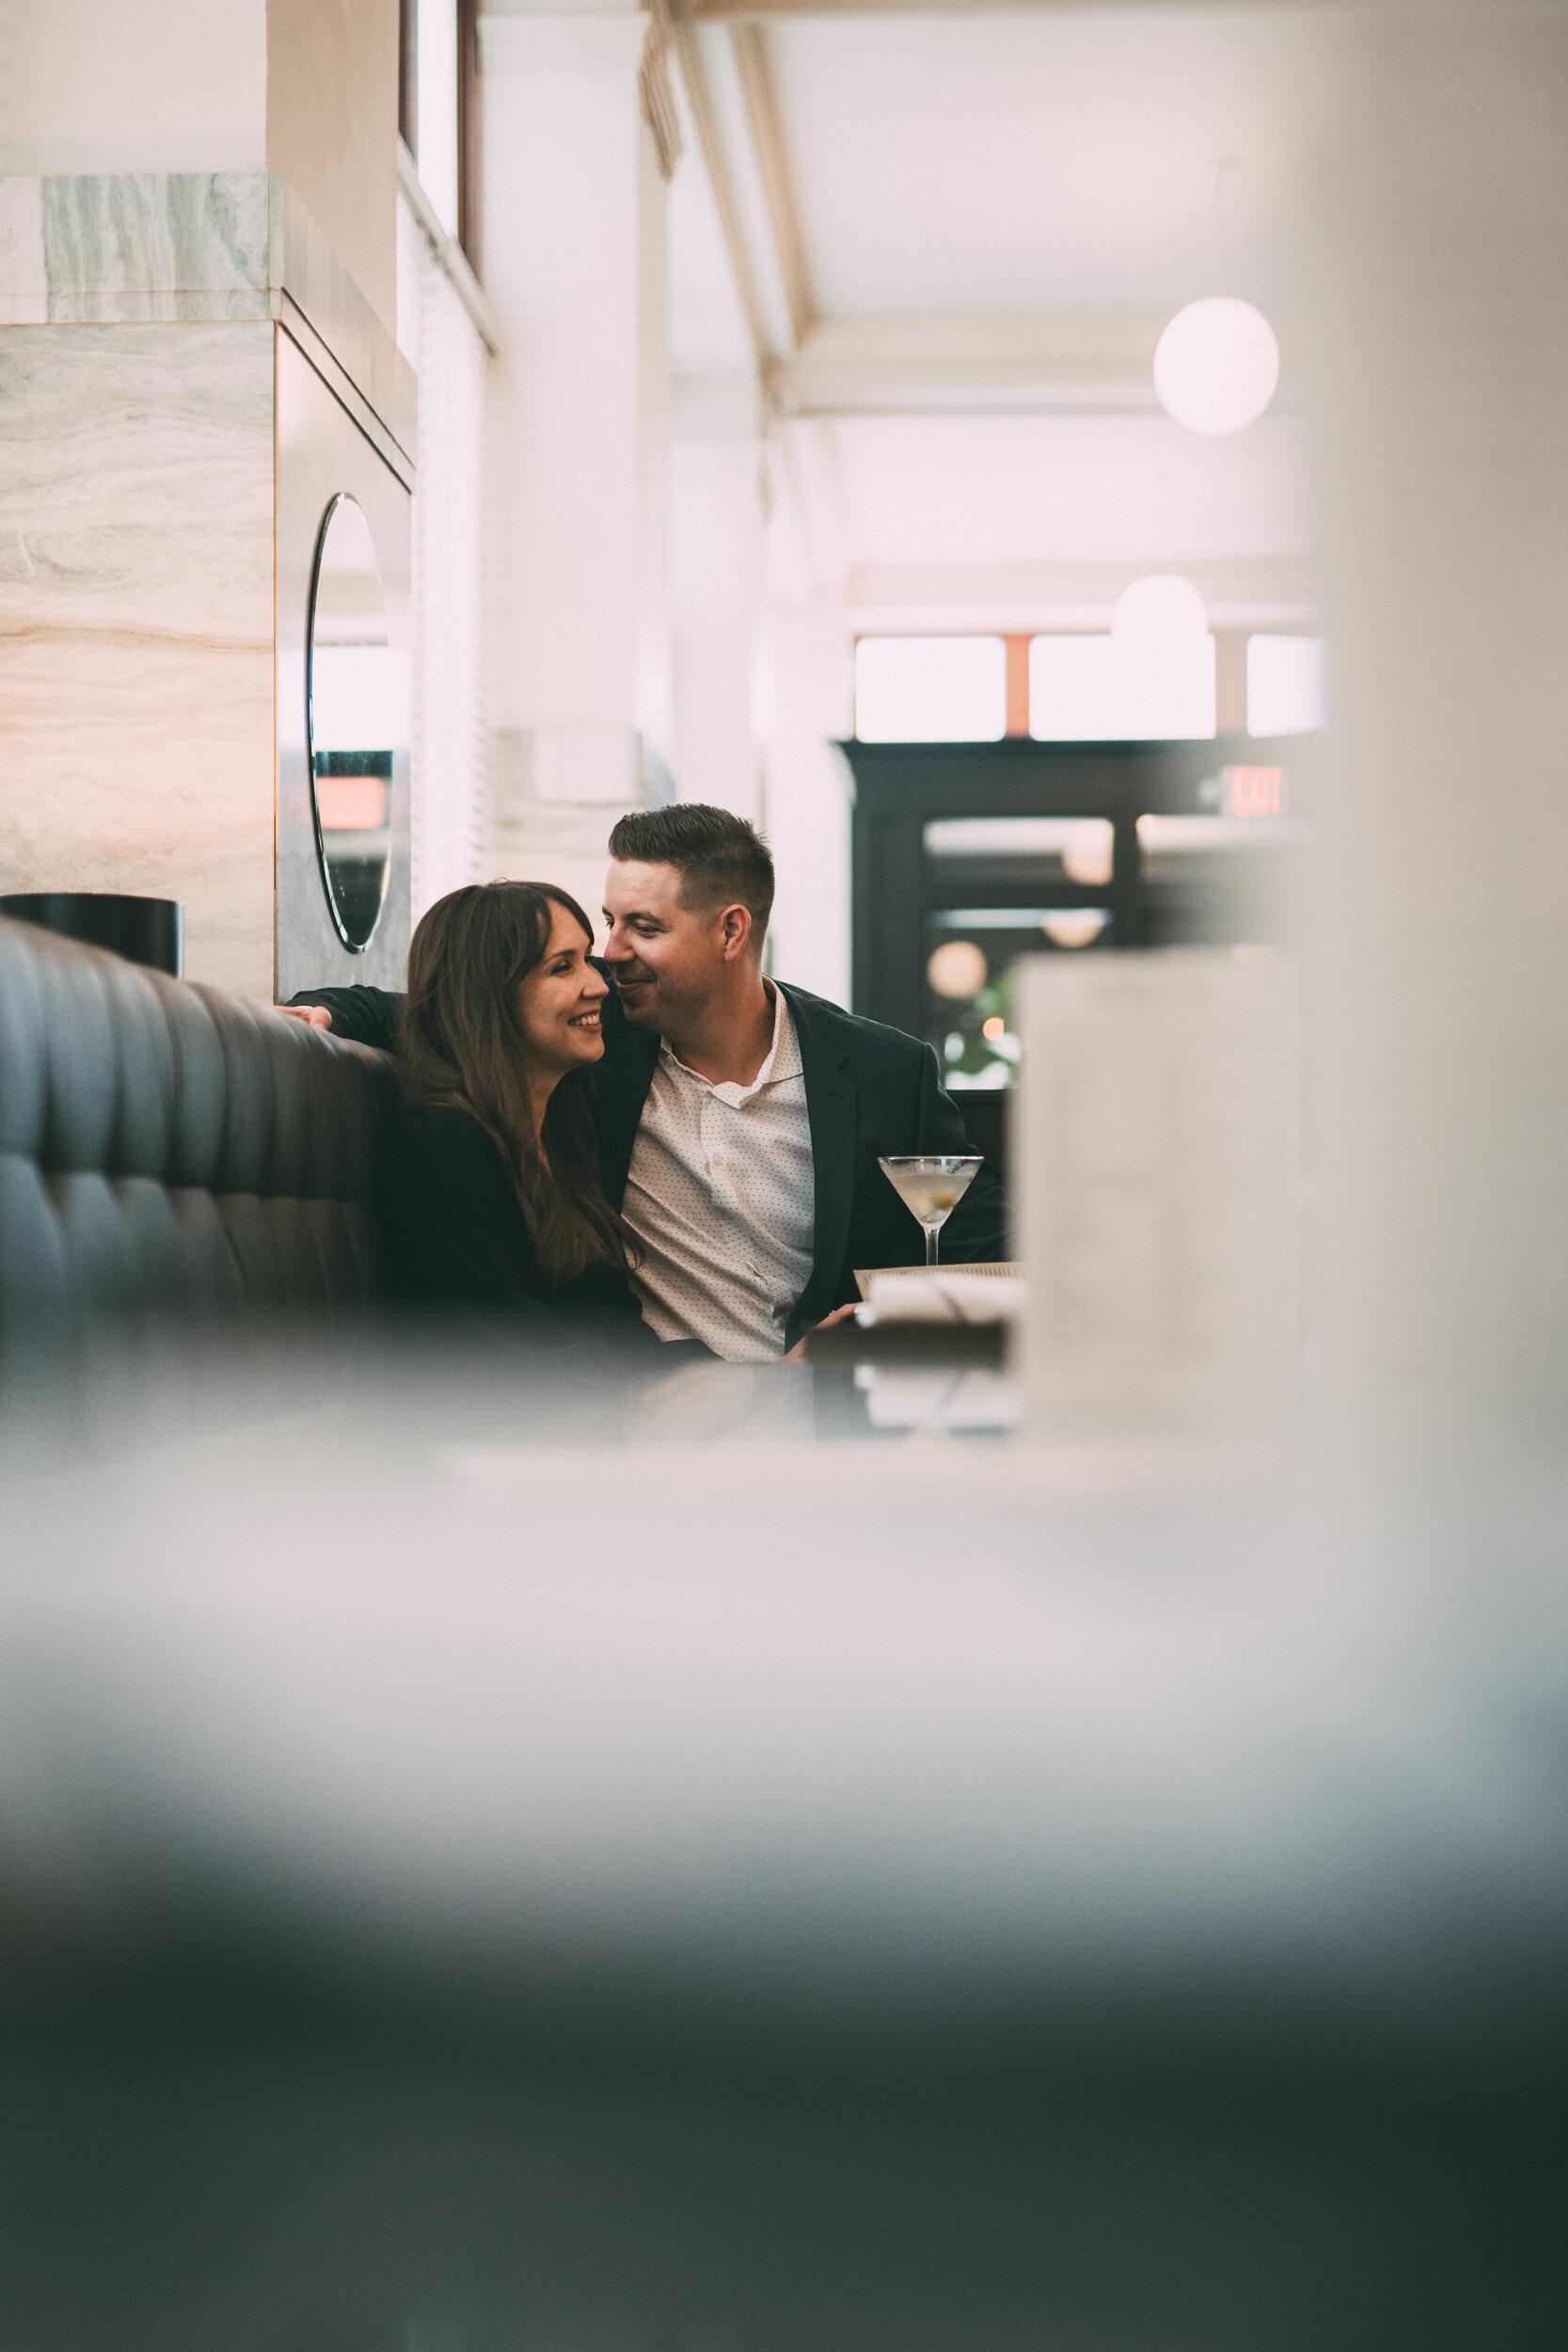 engagement session in restaurant bar